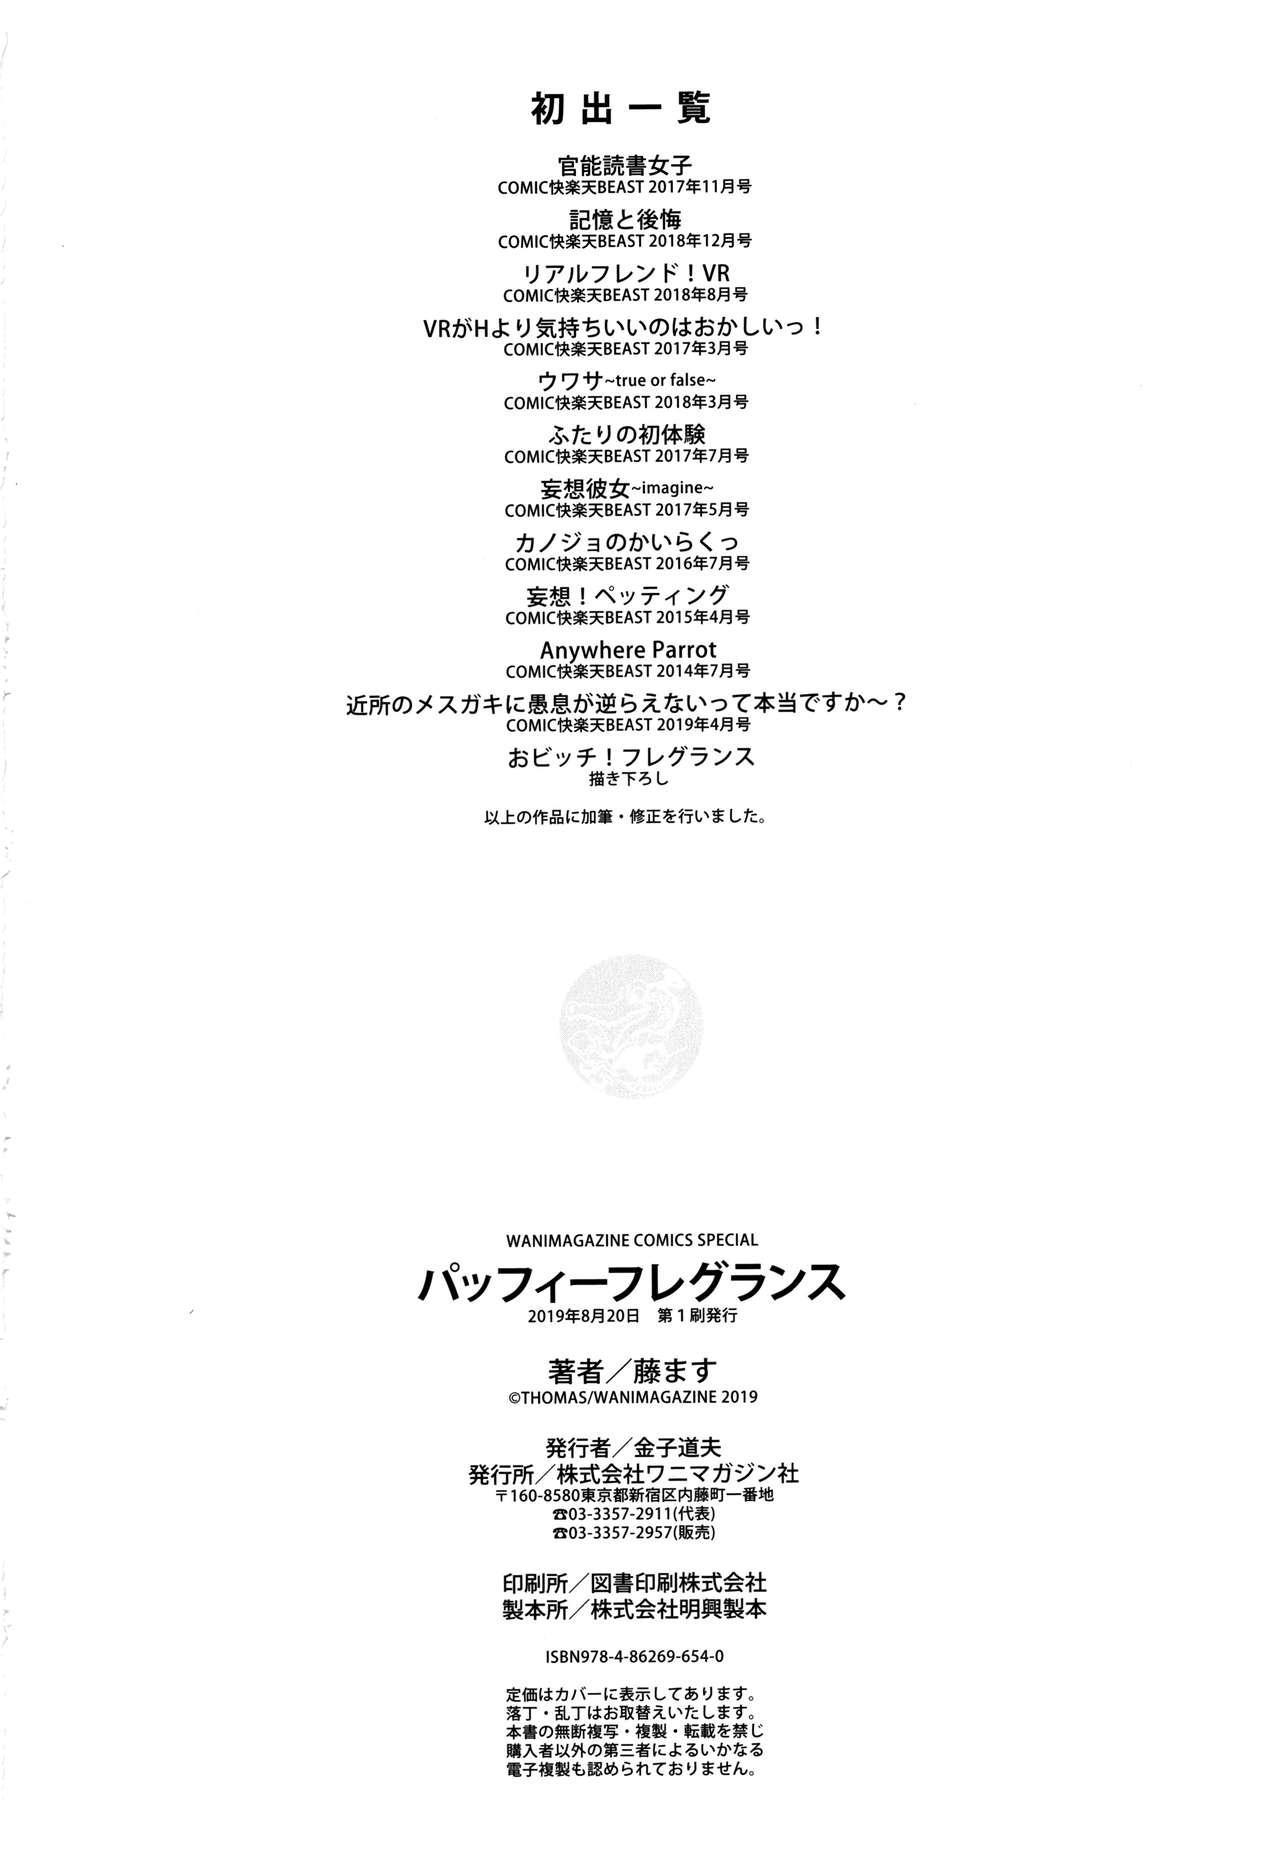 Chiisana Koukishin 198